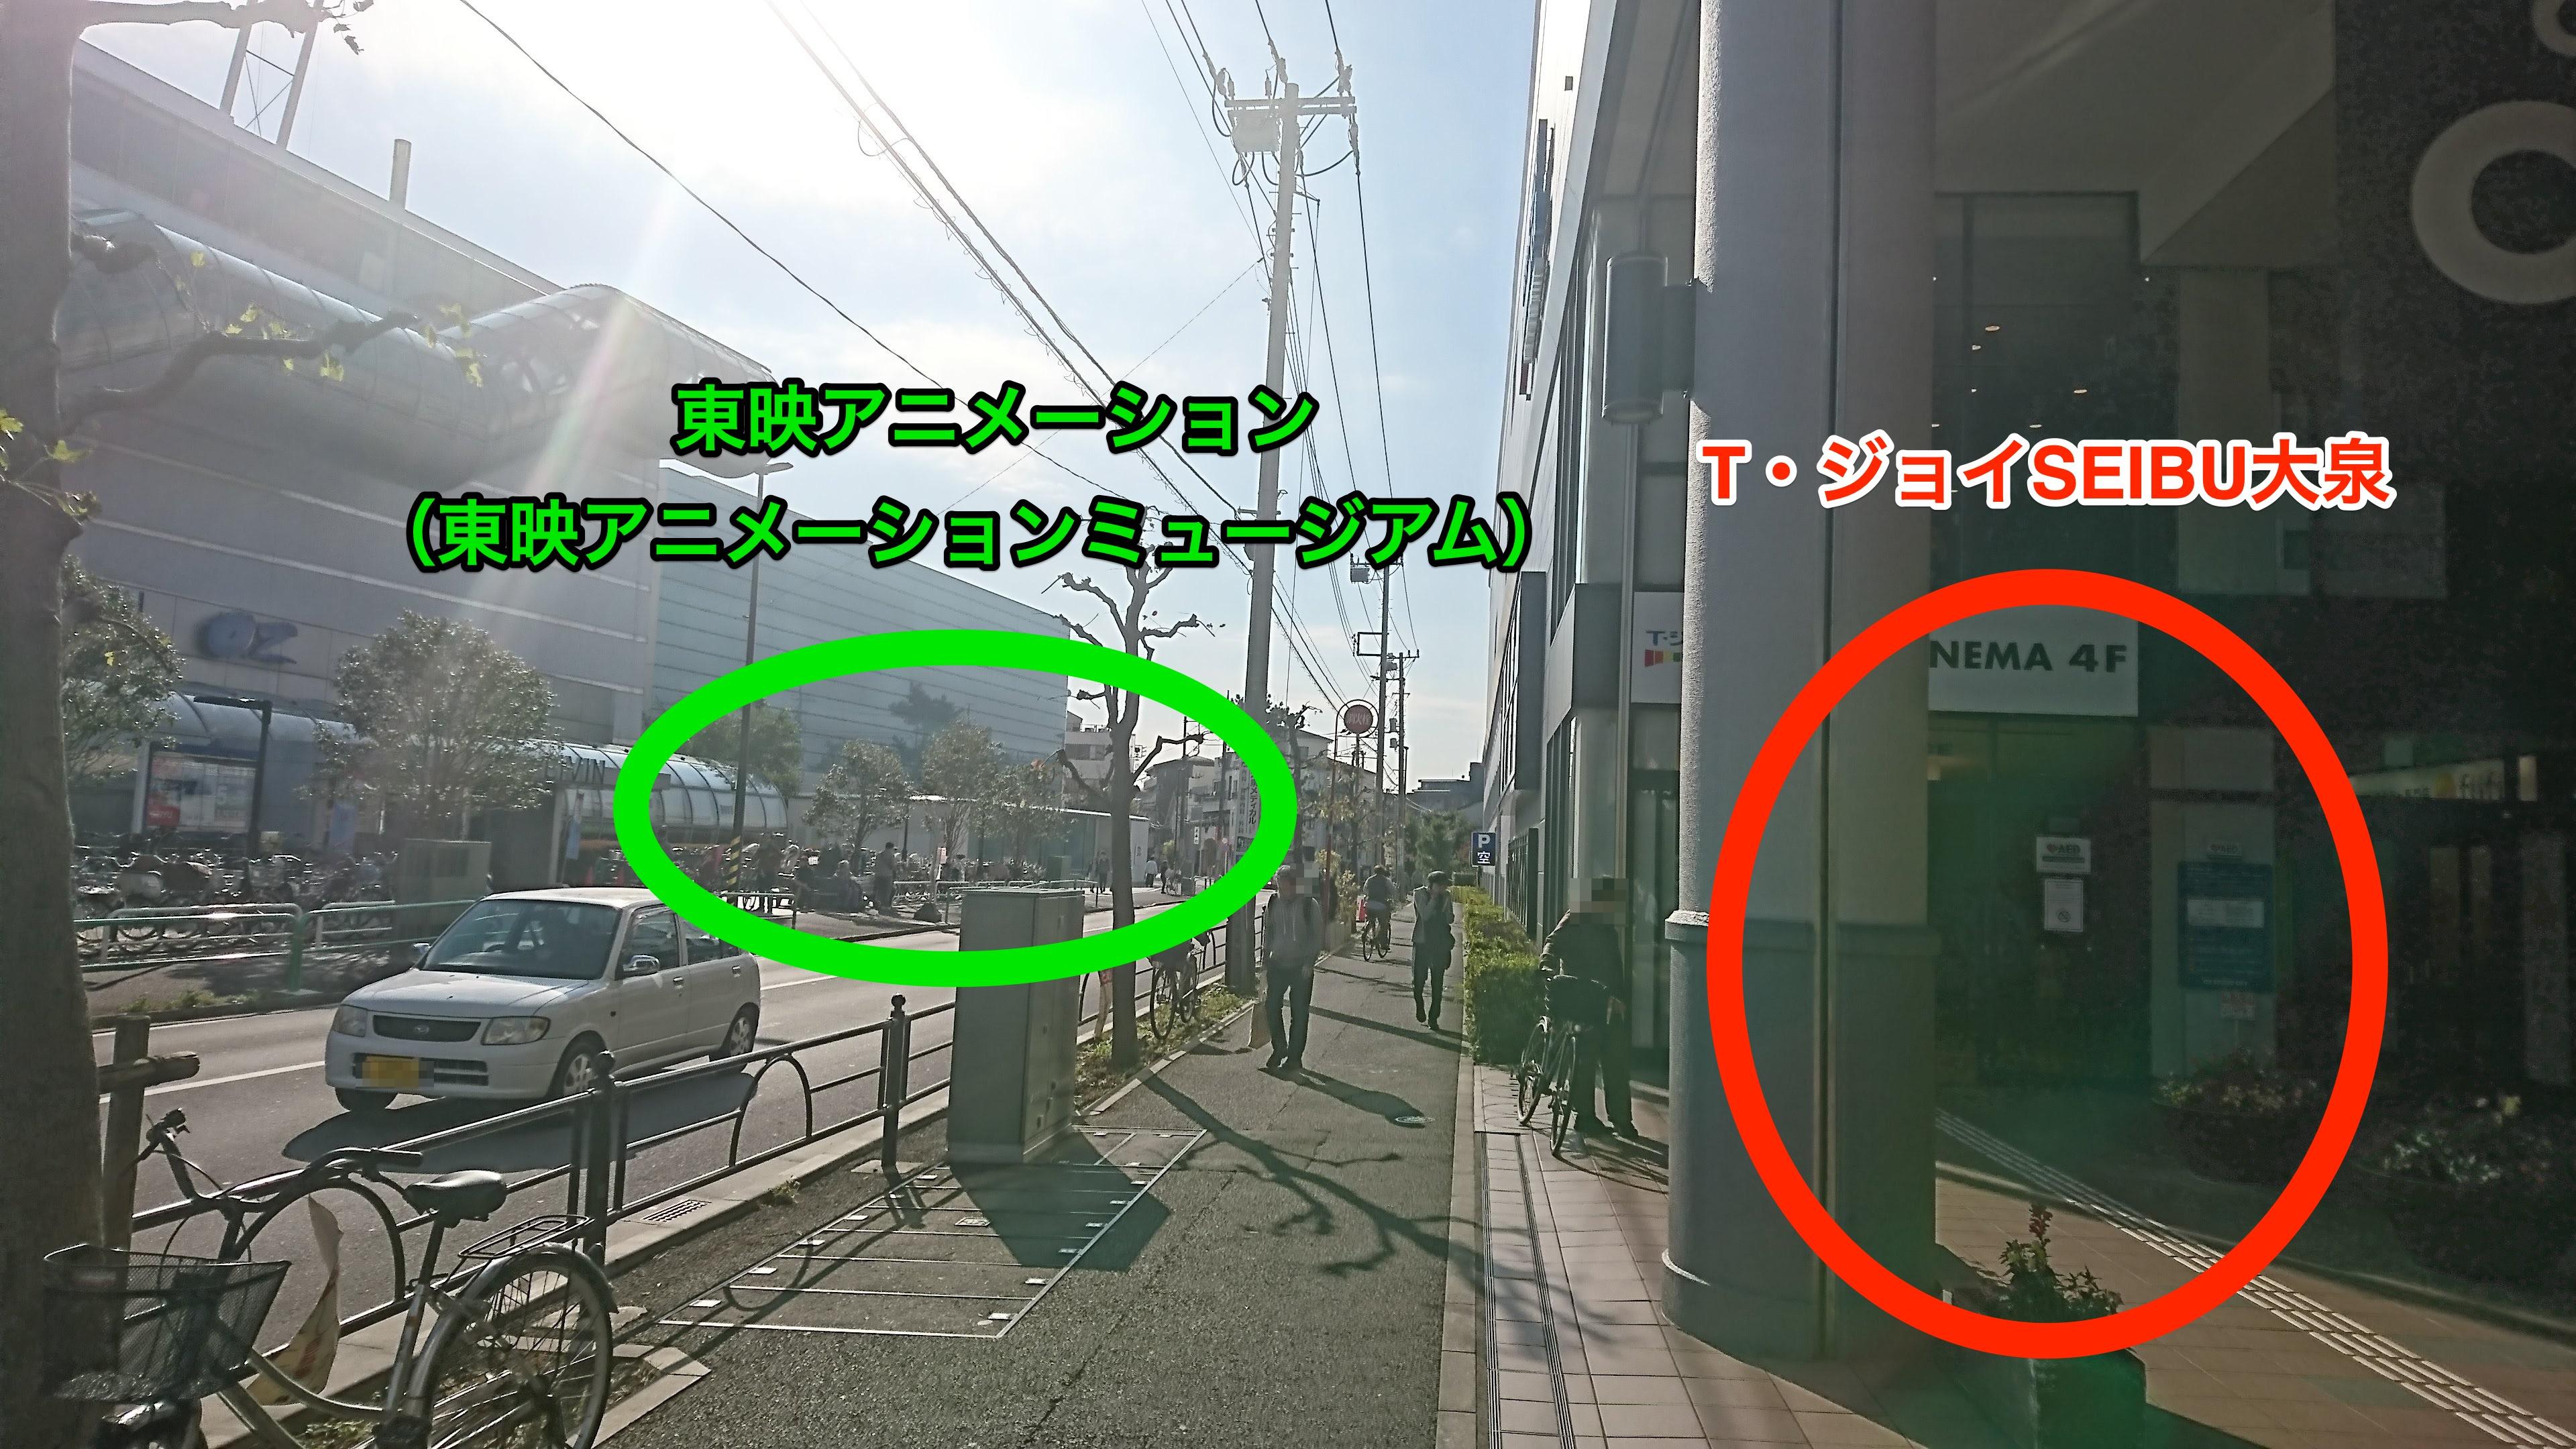 T・ジョイSEIBU大泉 東映アニメーション